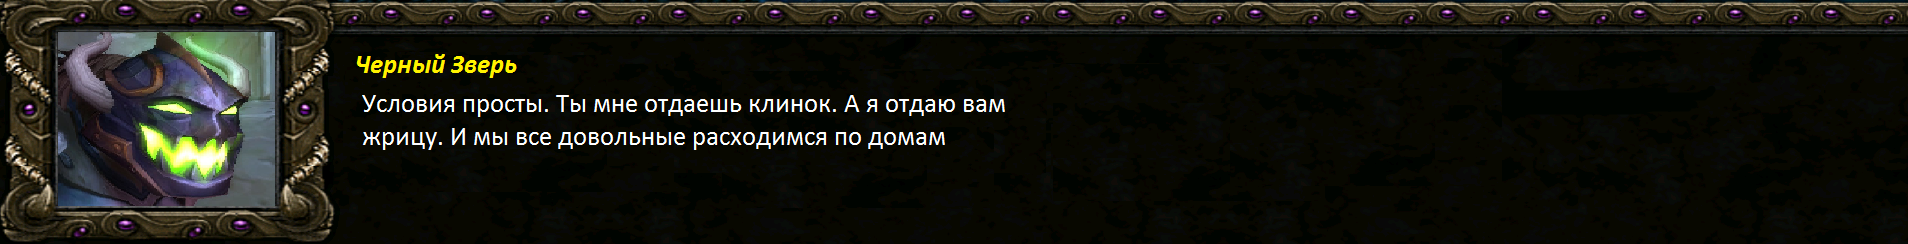 Диалог ДкВар 13 эпизод 24